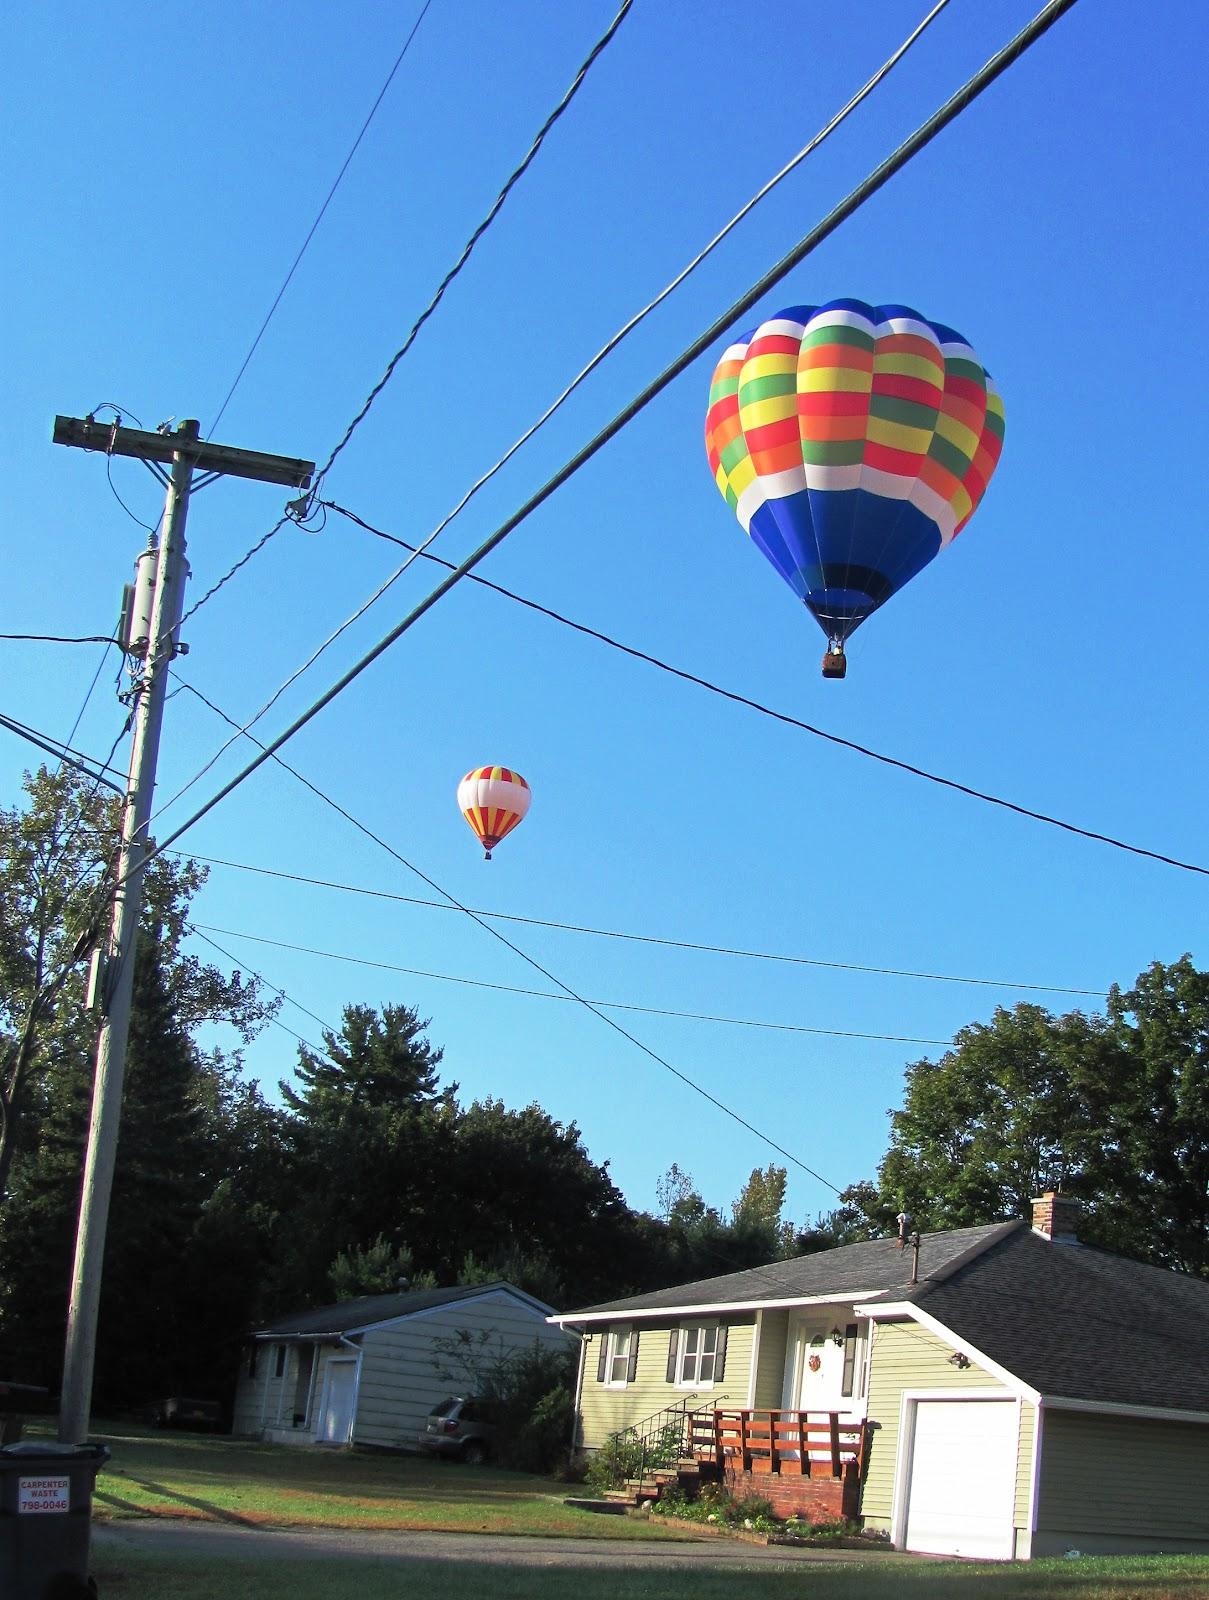 Up House Balloons U555u Images Pixar Up Balloons